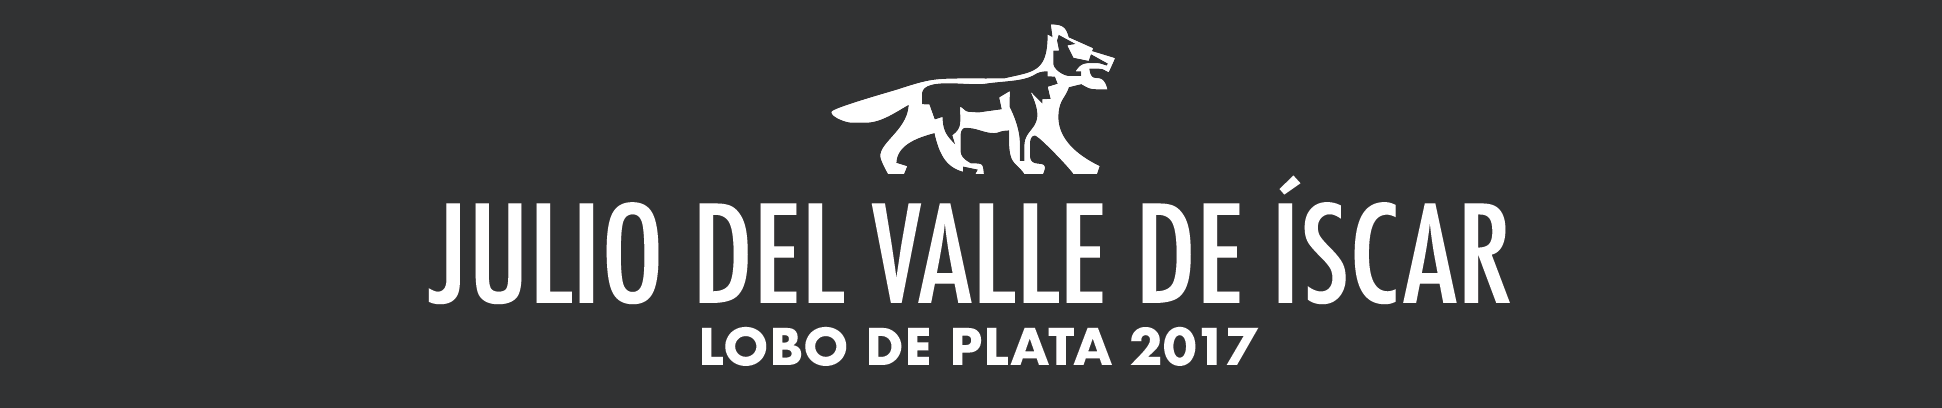 Entrega del Lobo de Plata 2017